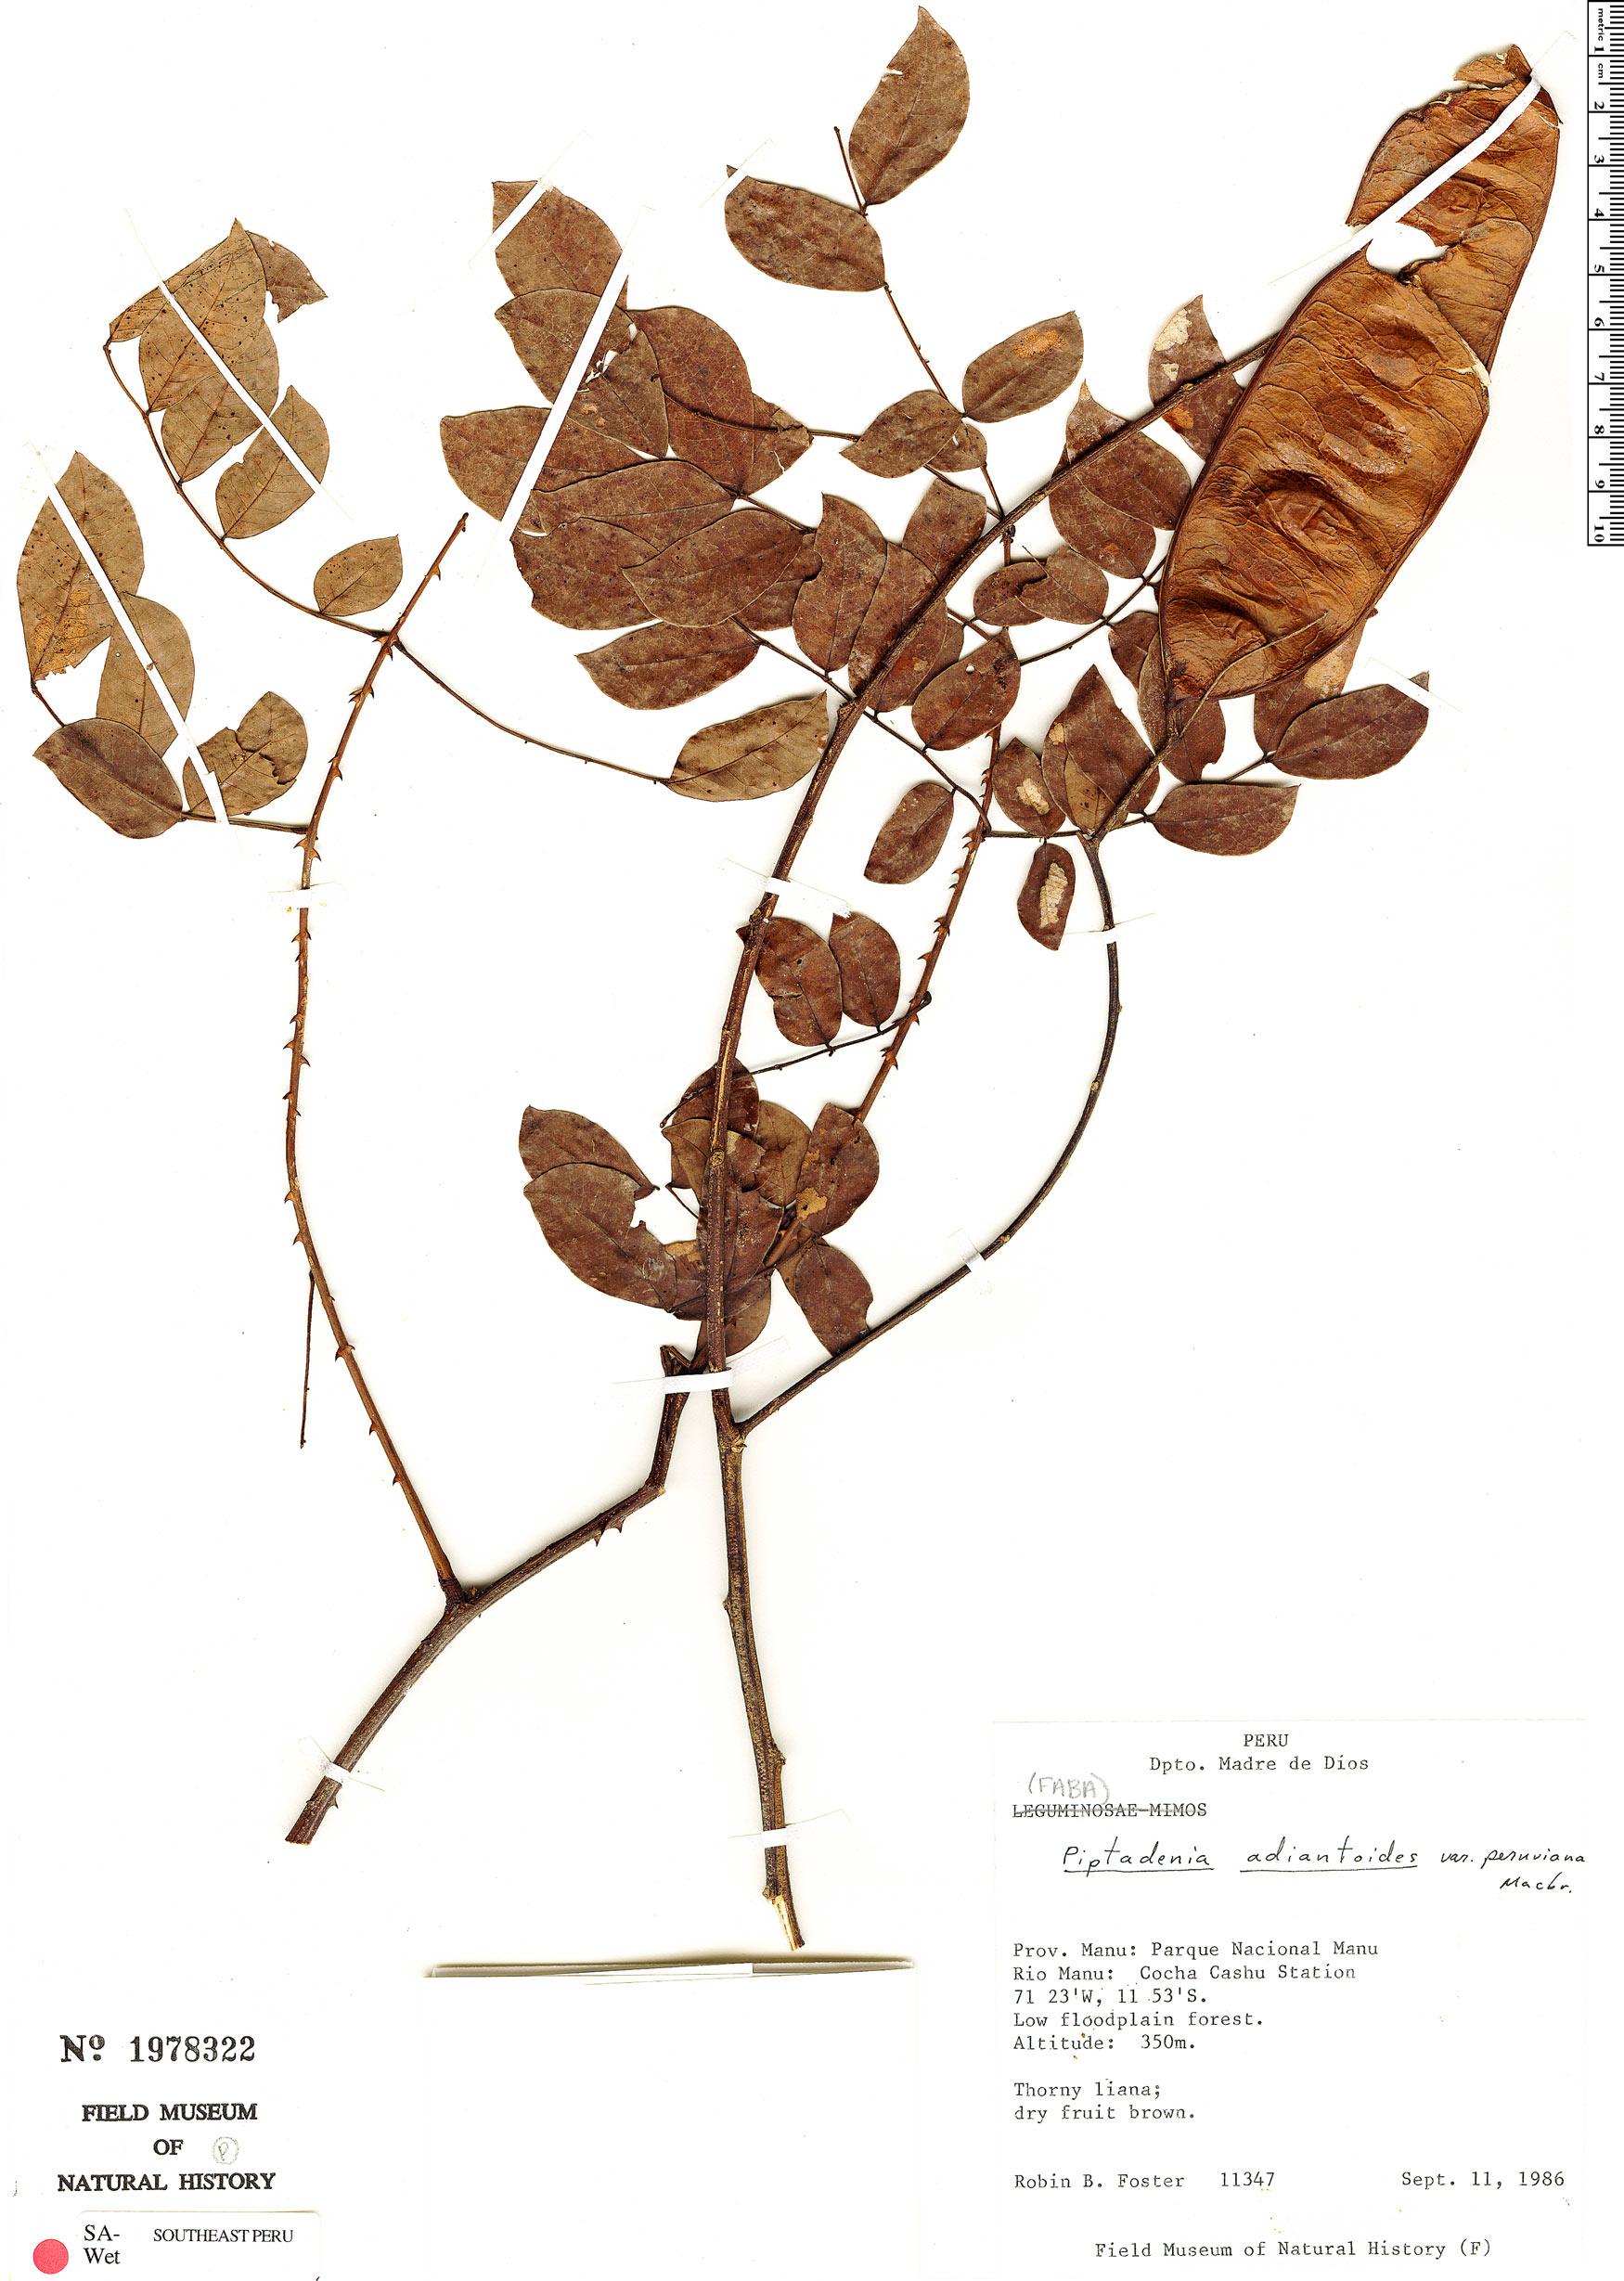 Specimen: Piptadenia peruviana